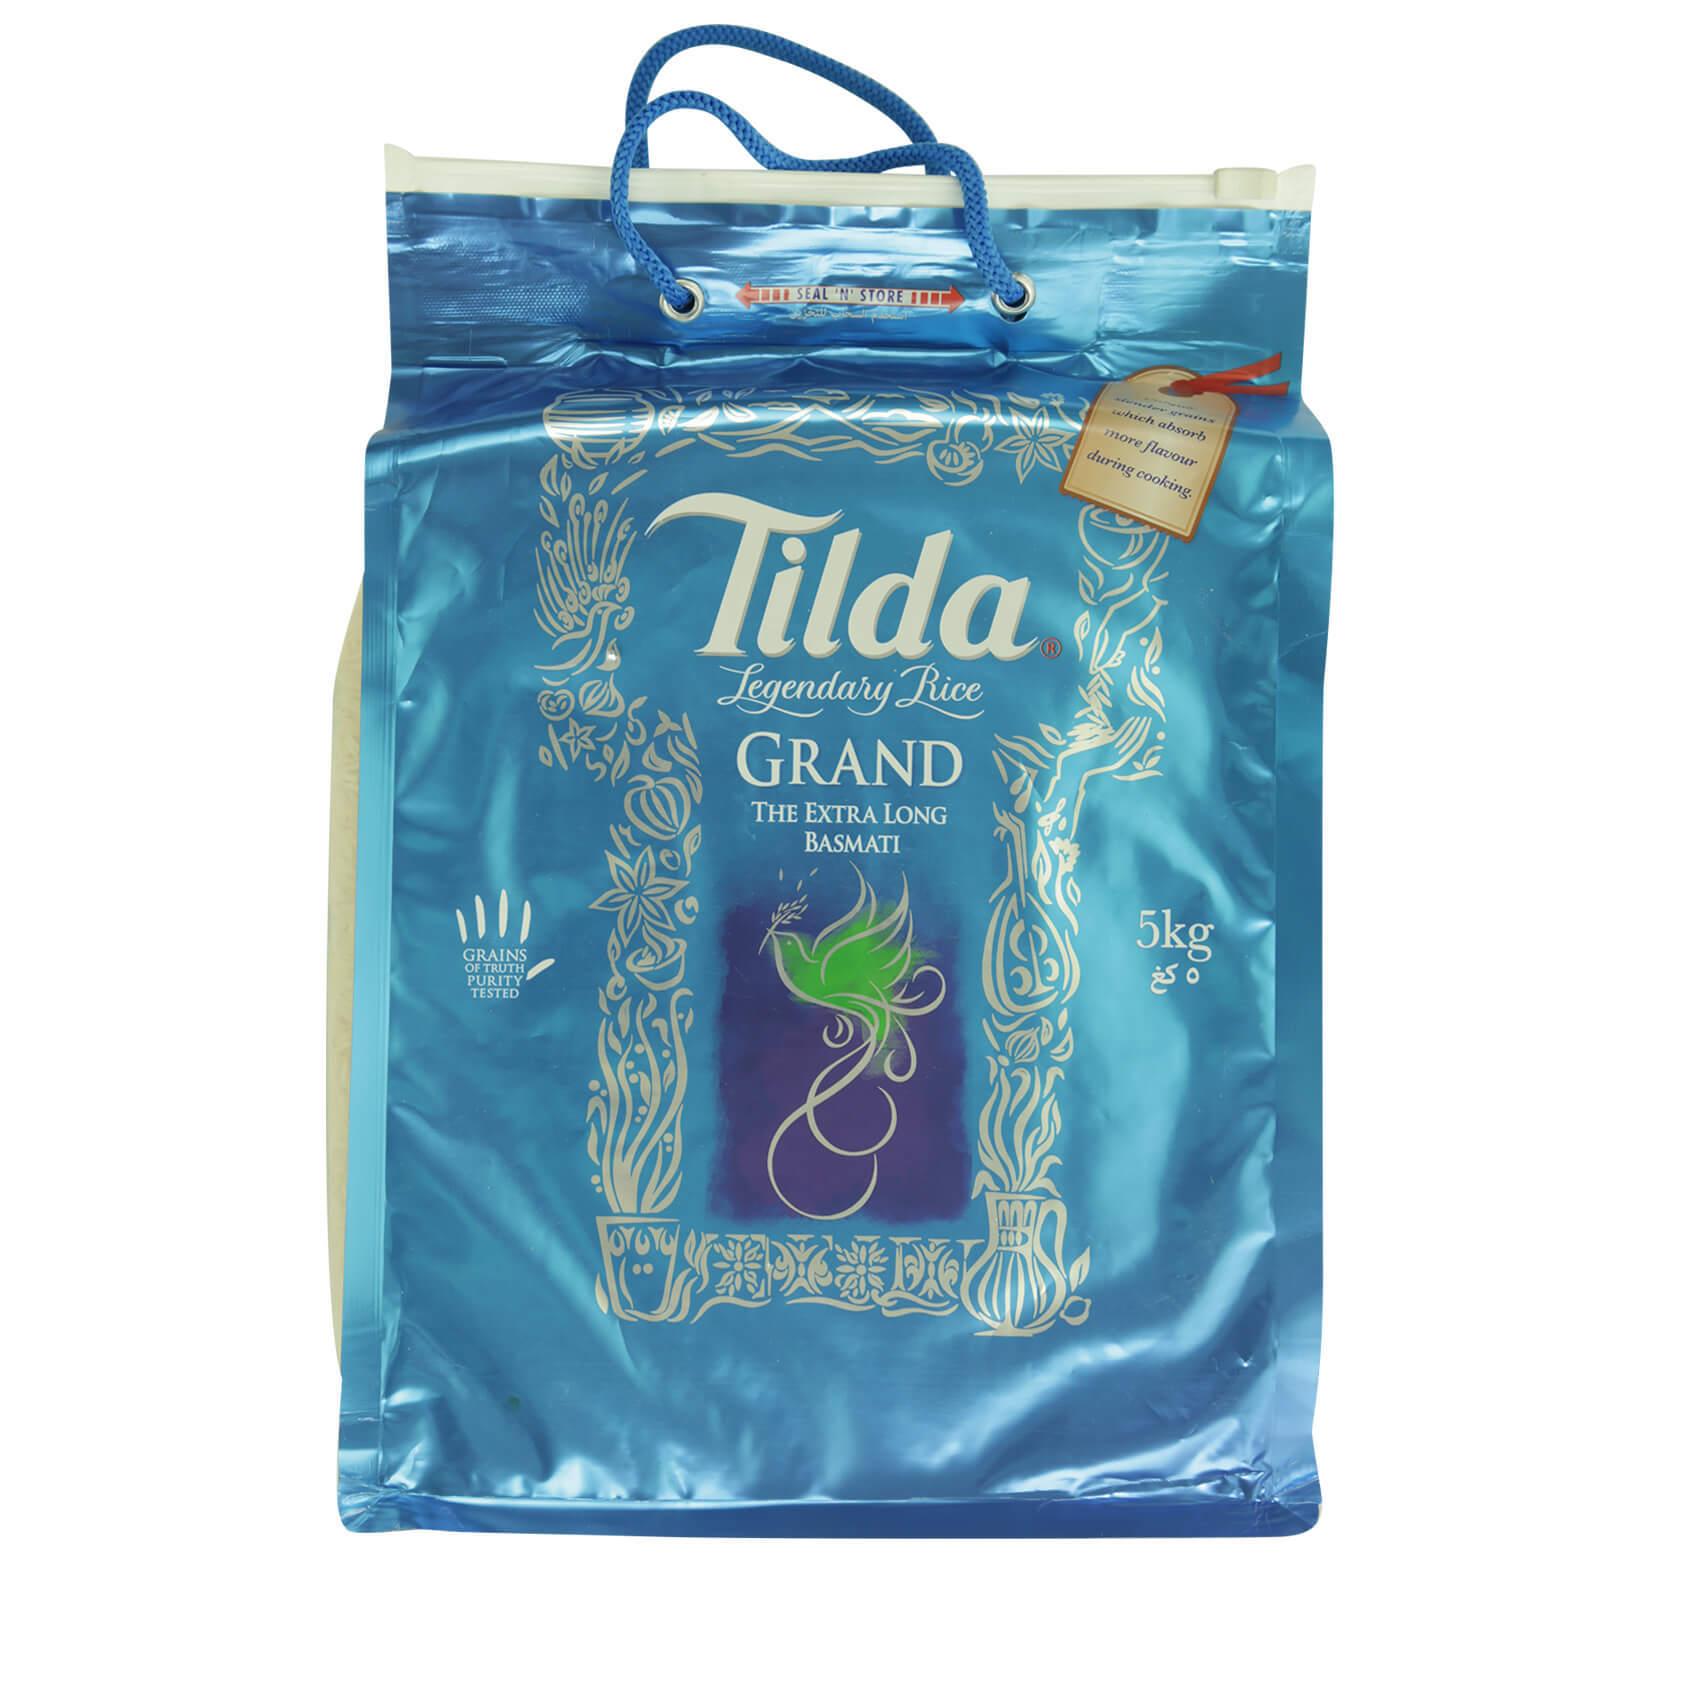 TILDA GRAND XTR LONG BASMATI 5KG